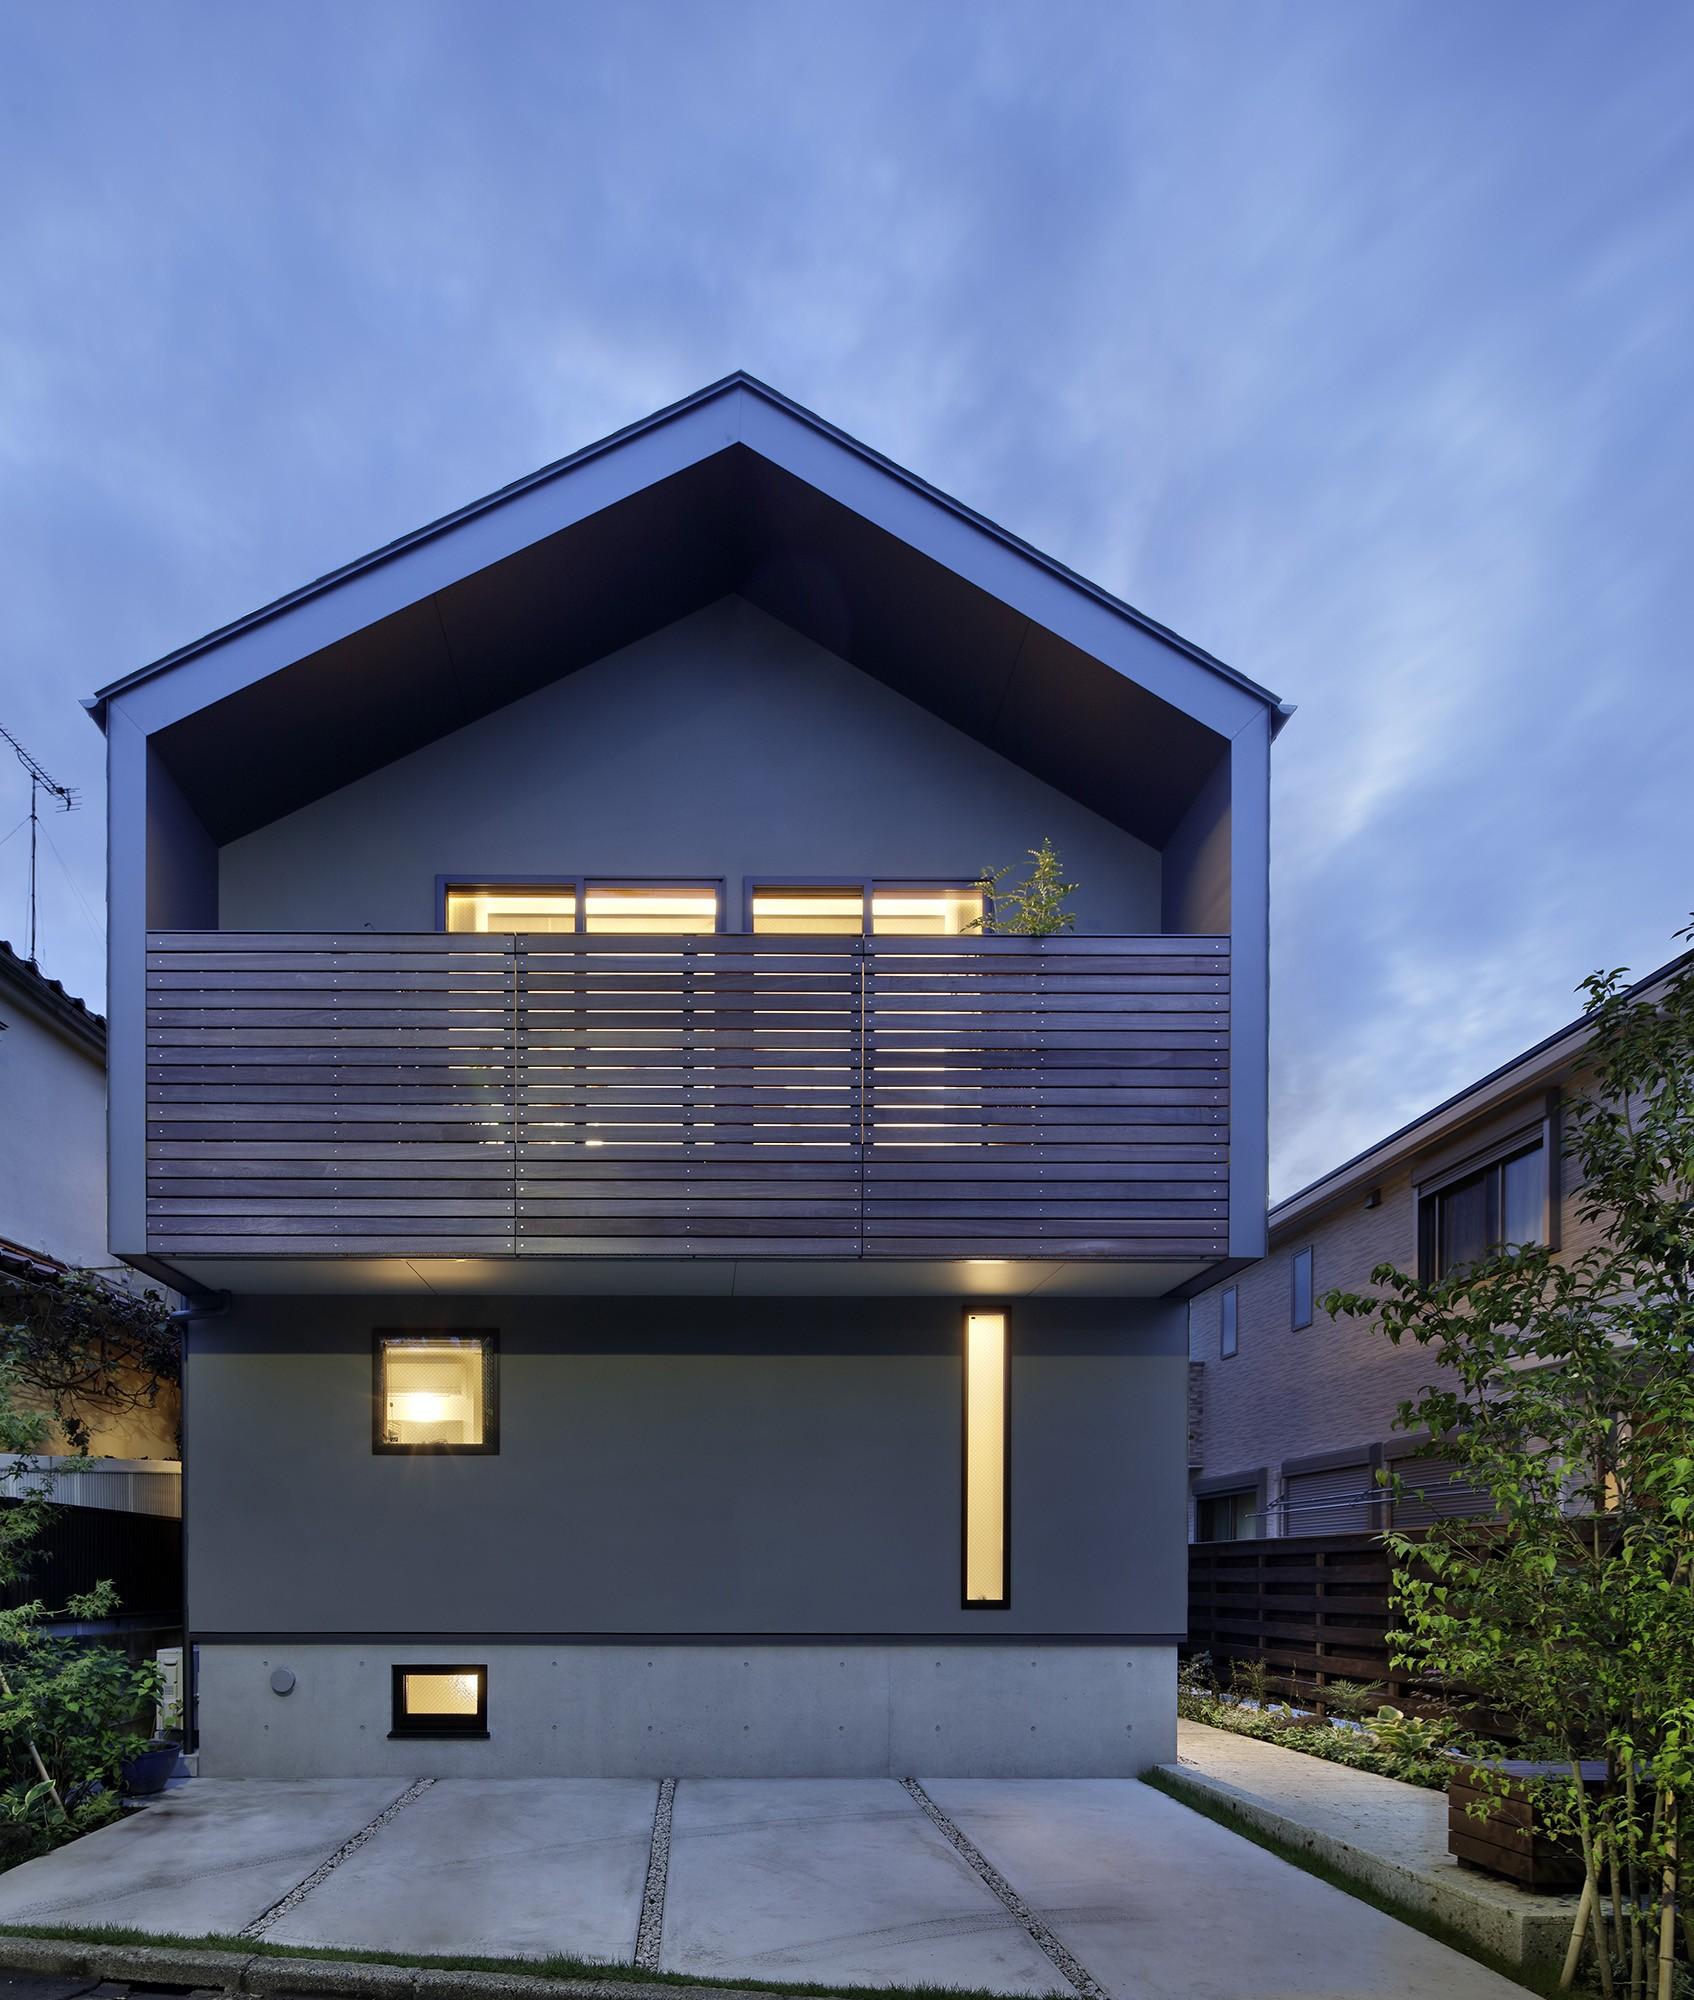 外観事例:外観夕景(桜上水の住宅 / 半地下と屋上の効果)